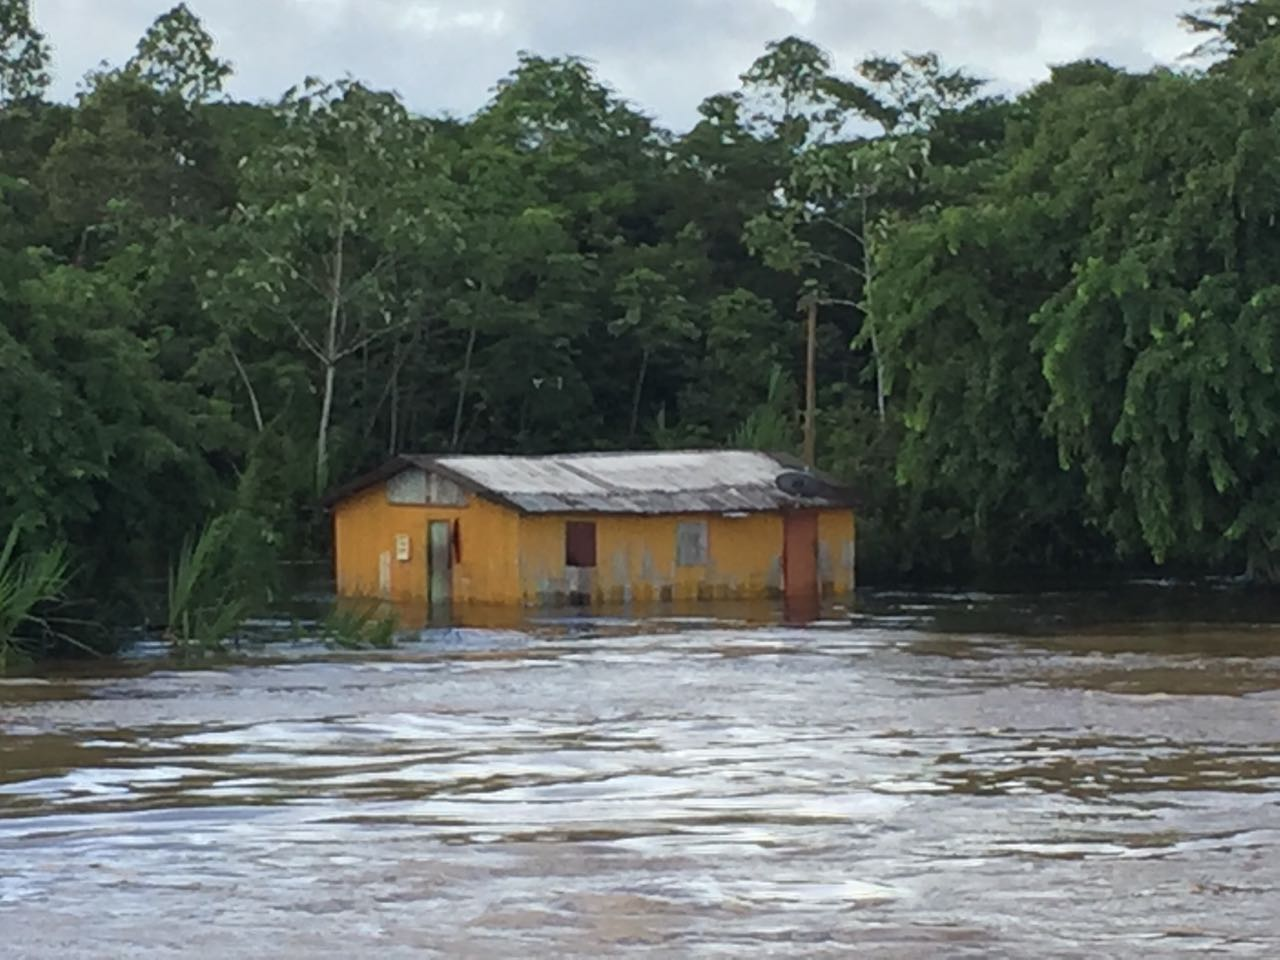 Flooded home along Rio Juruá near Cruzeiro do Sul, Brazil, Jan 28 2017.